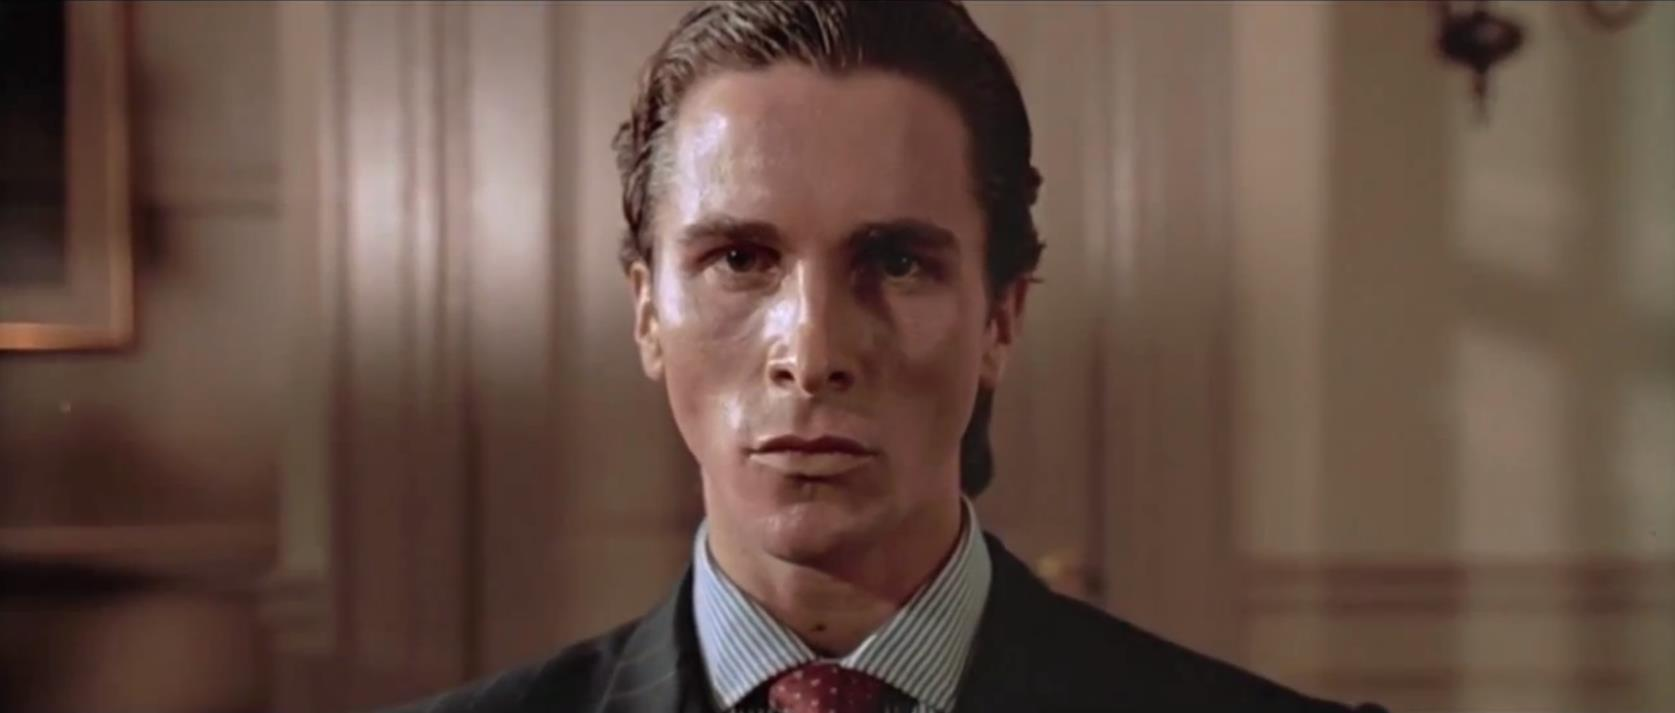 Conflicting Identities in American Psycho | Redbrick Film